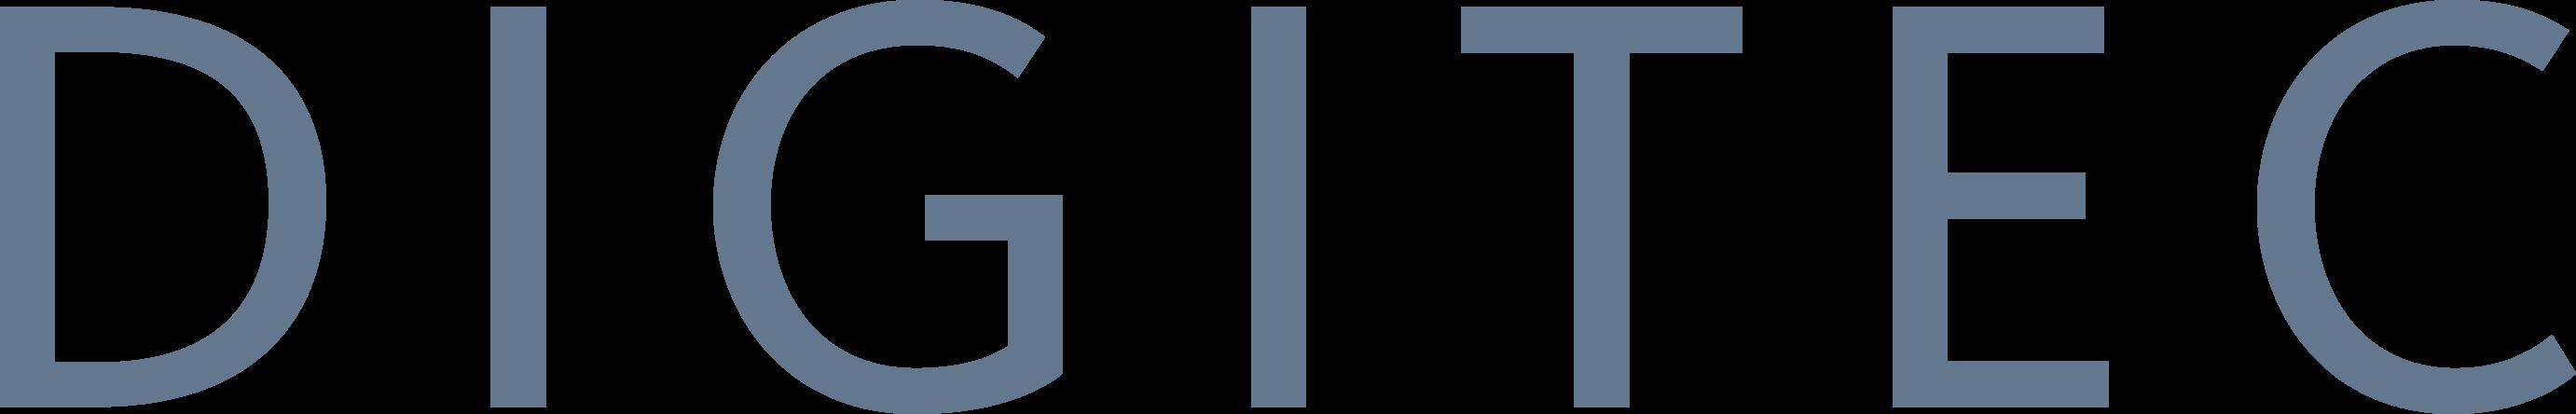 DIGITEC GmbH logo